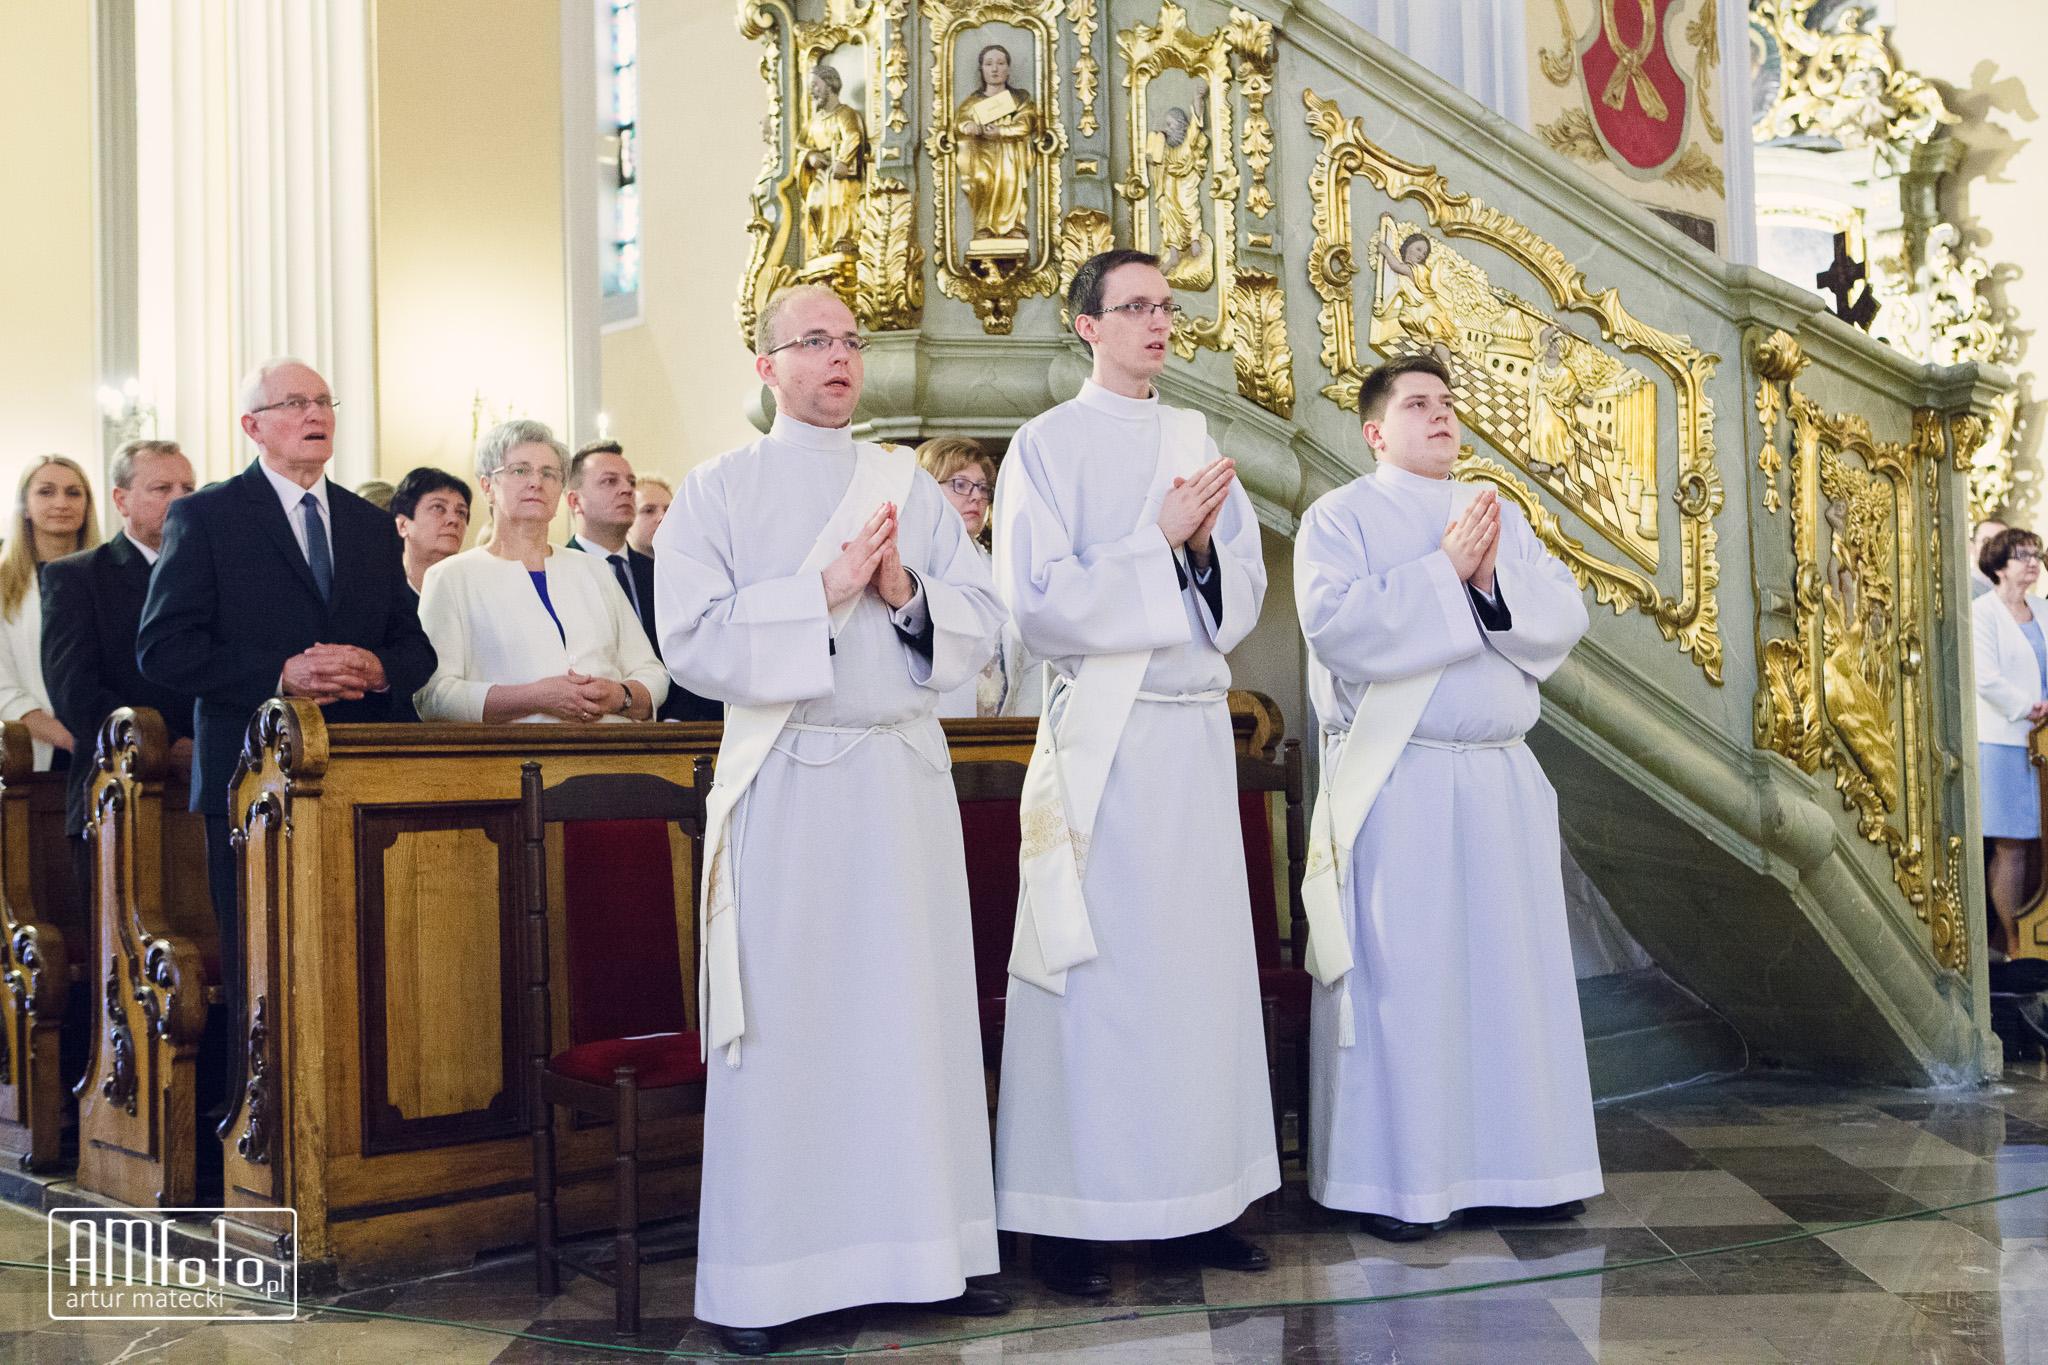 Swiecenia_Prezbiteratu_27-05-2017__Kalisz____www_amfoto_pl___0142_____MG_3401.jpg